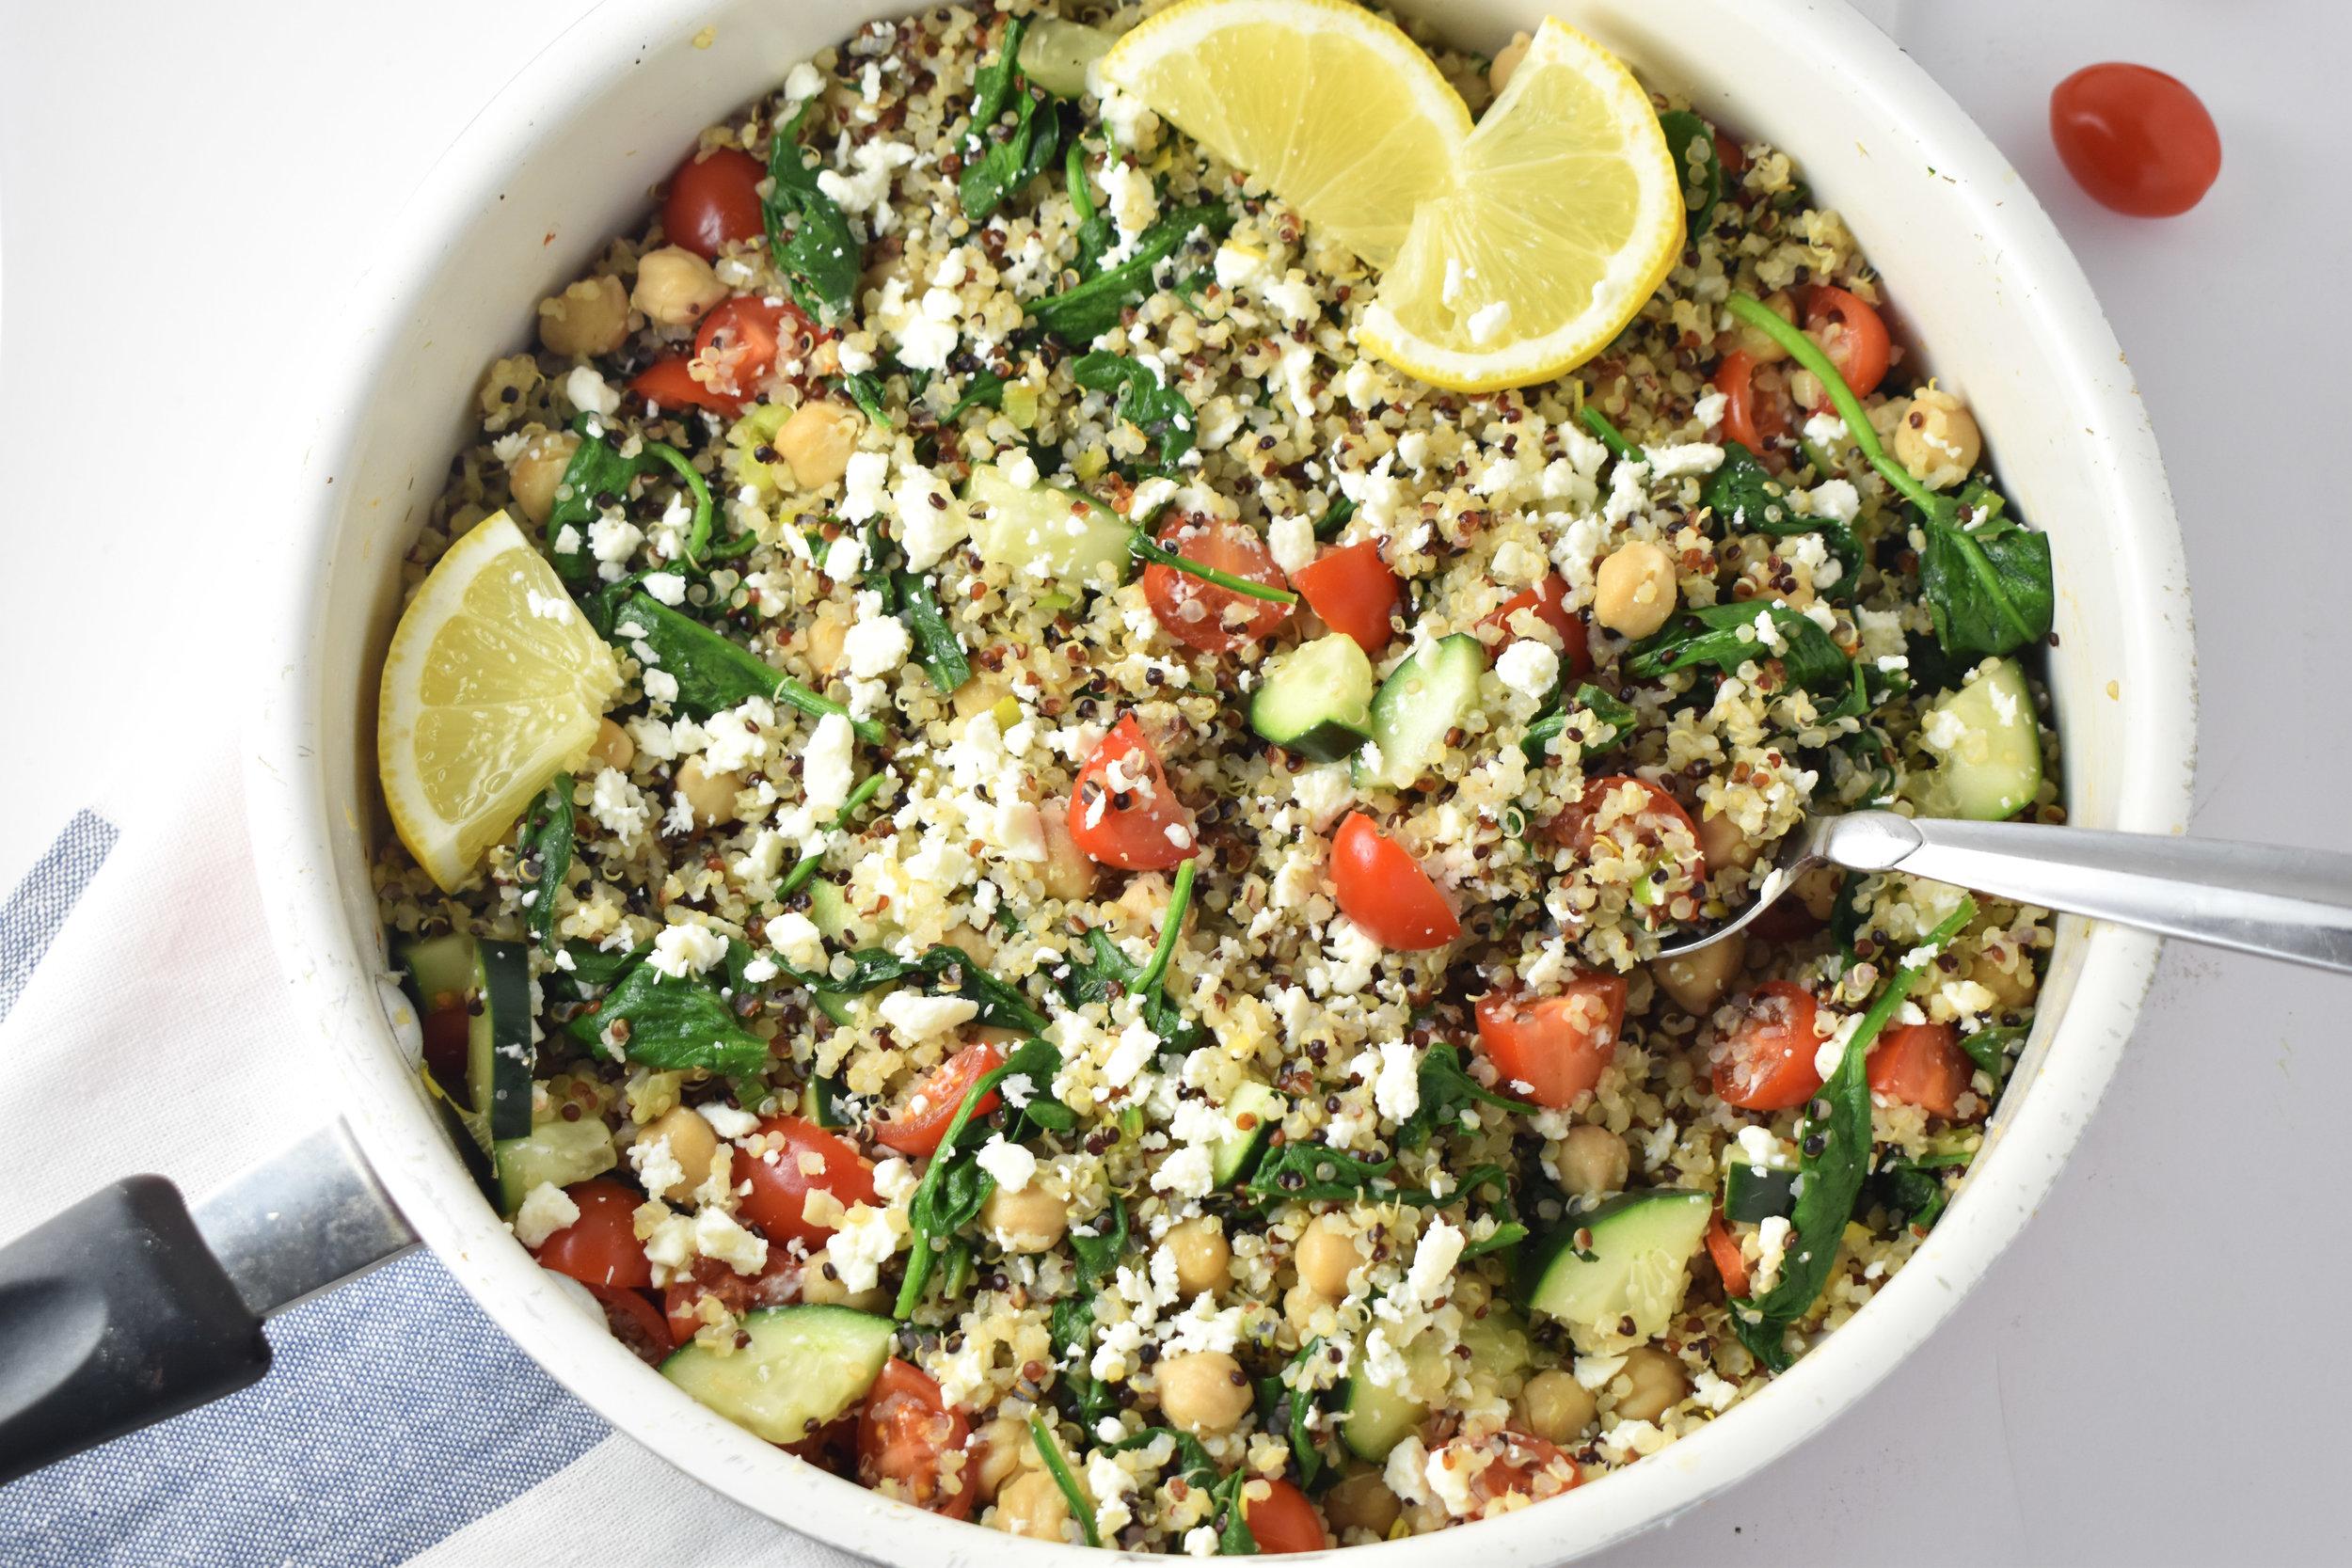 10-Minute Dinners: Mediterranean Fried Quinoa / CarolynWilliamsRD.com